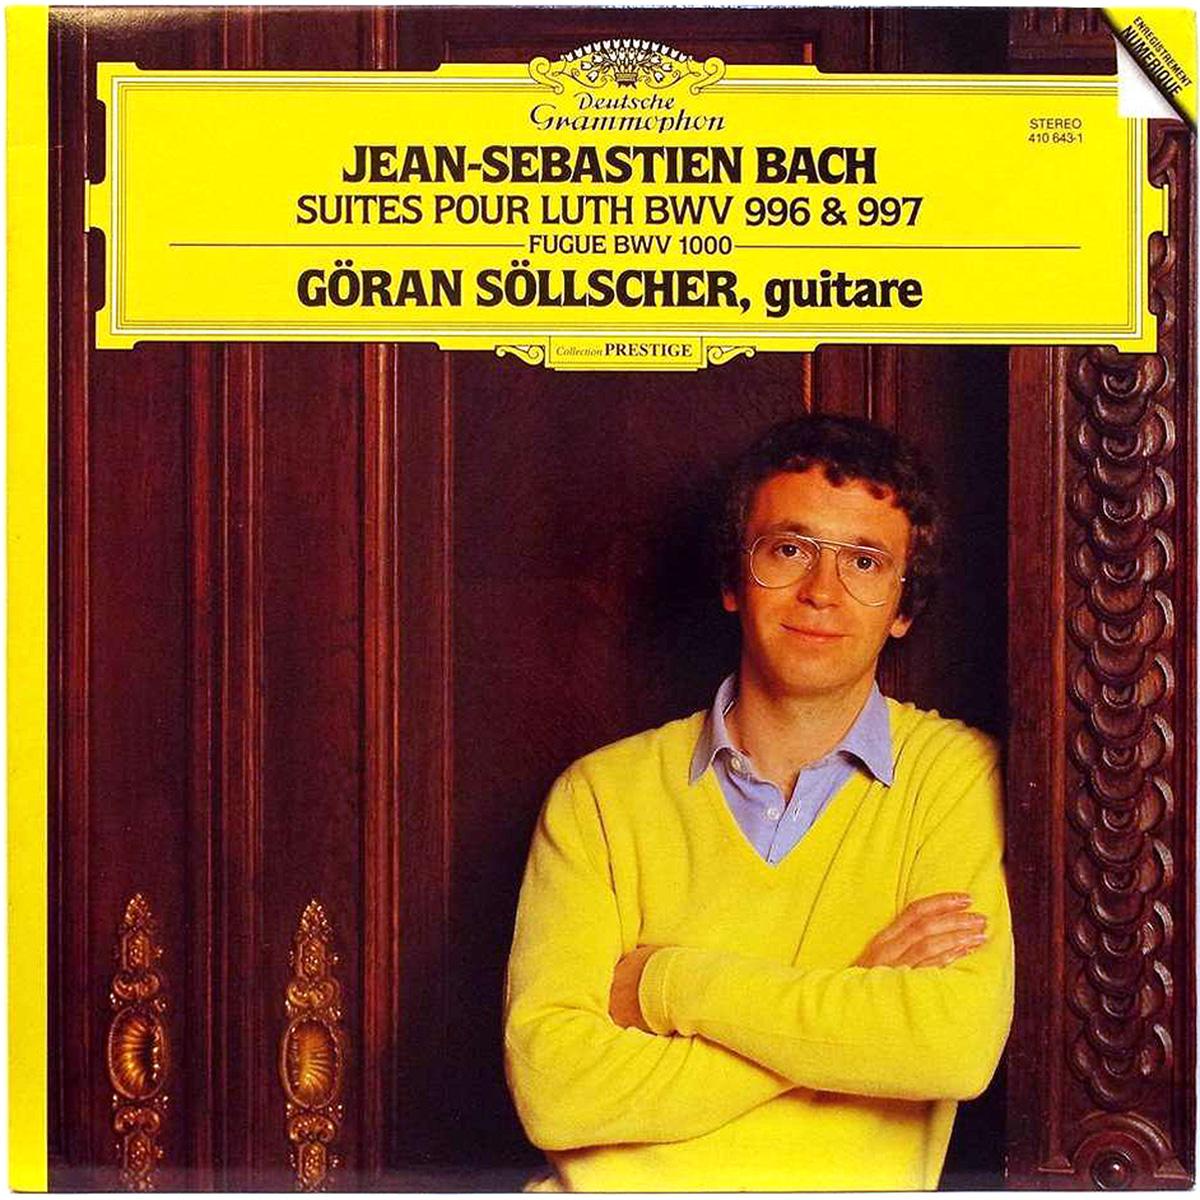 DGG 410 643 Bach Suites Luth BWV 996 & 997Sollcher DGG Digital Aufnahme